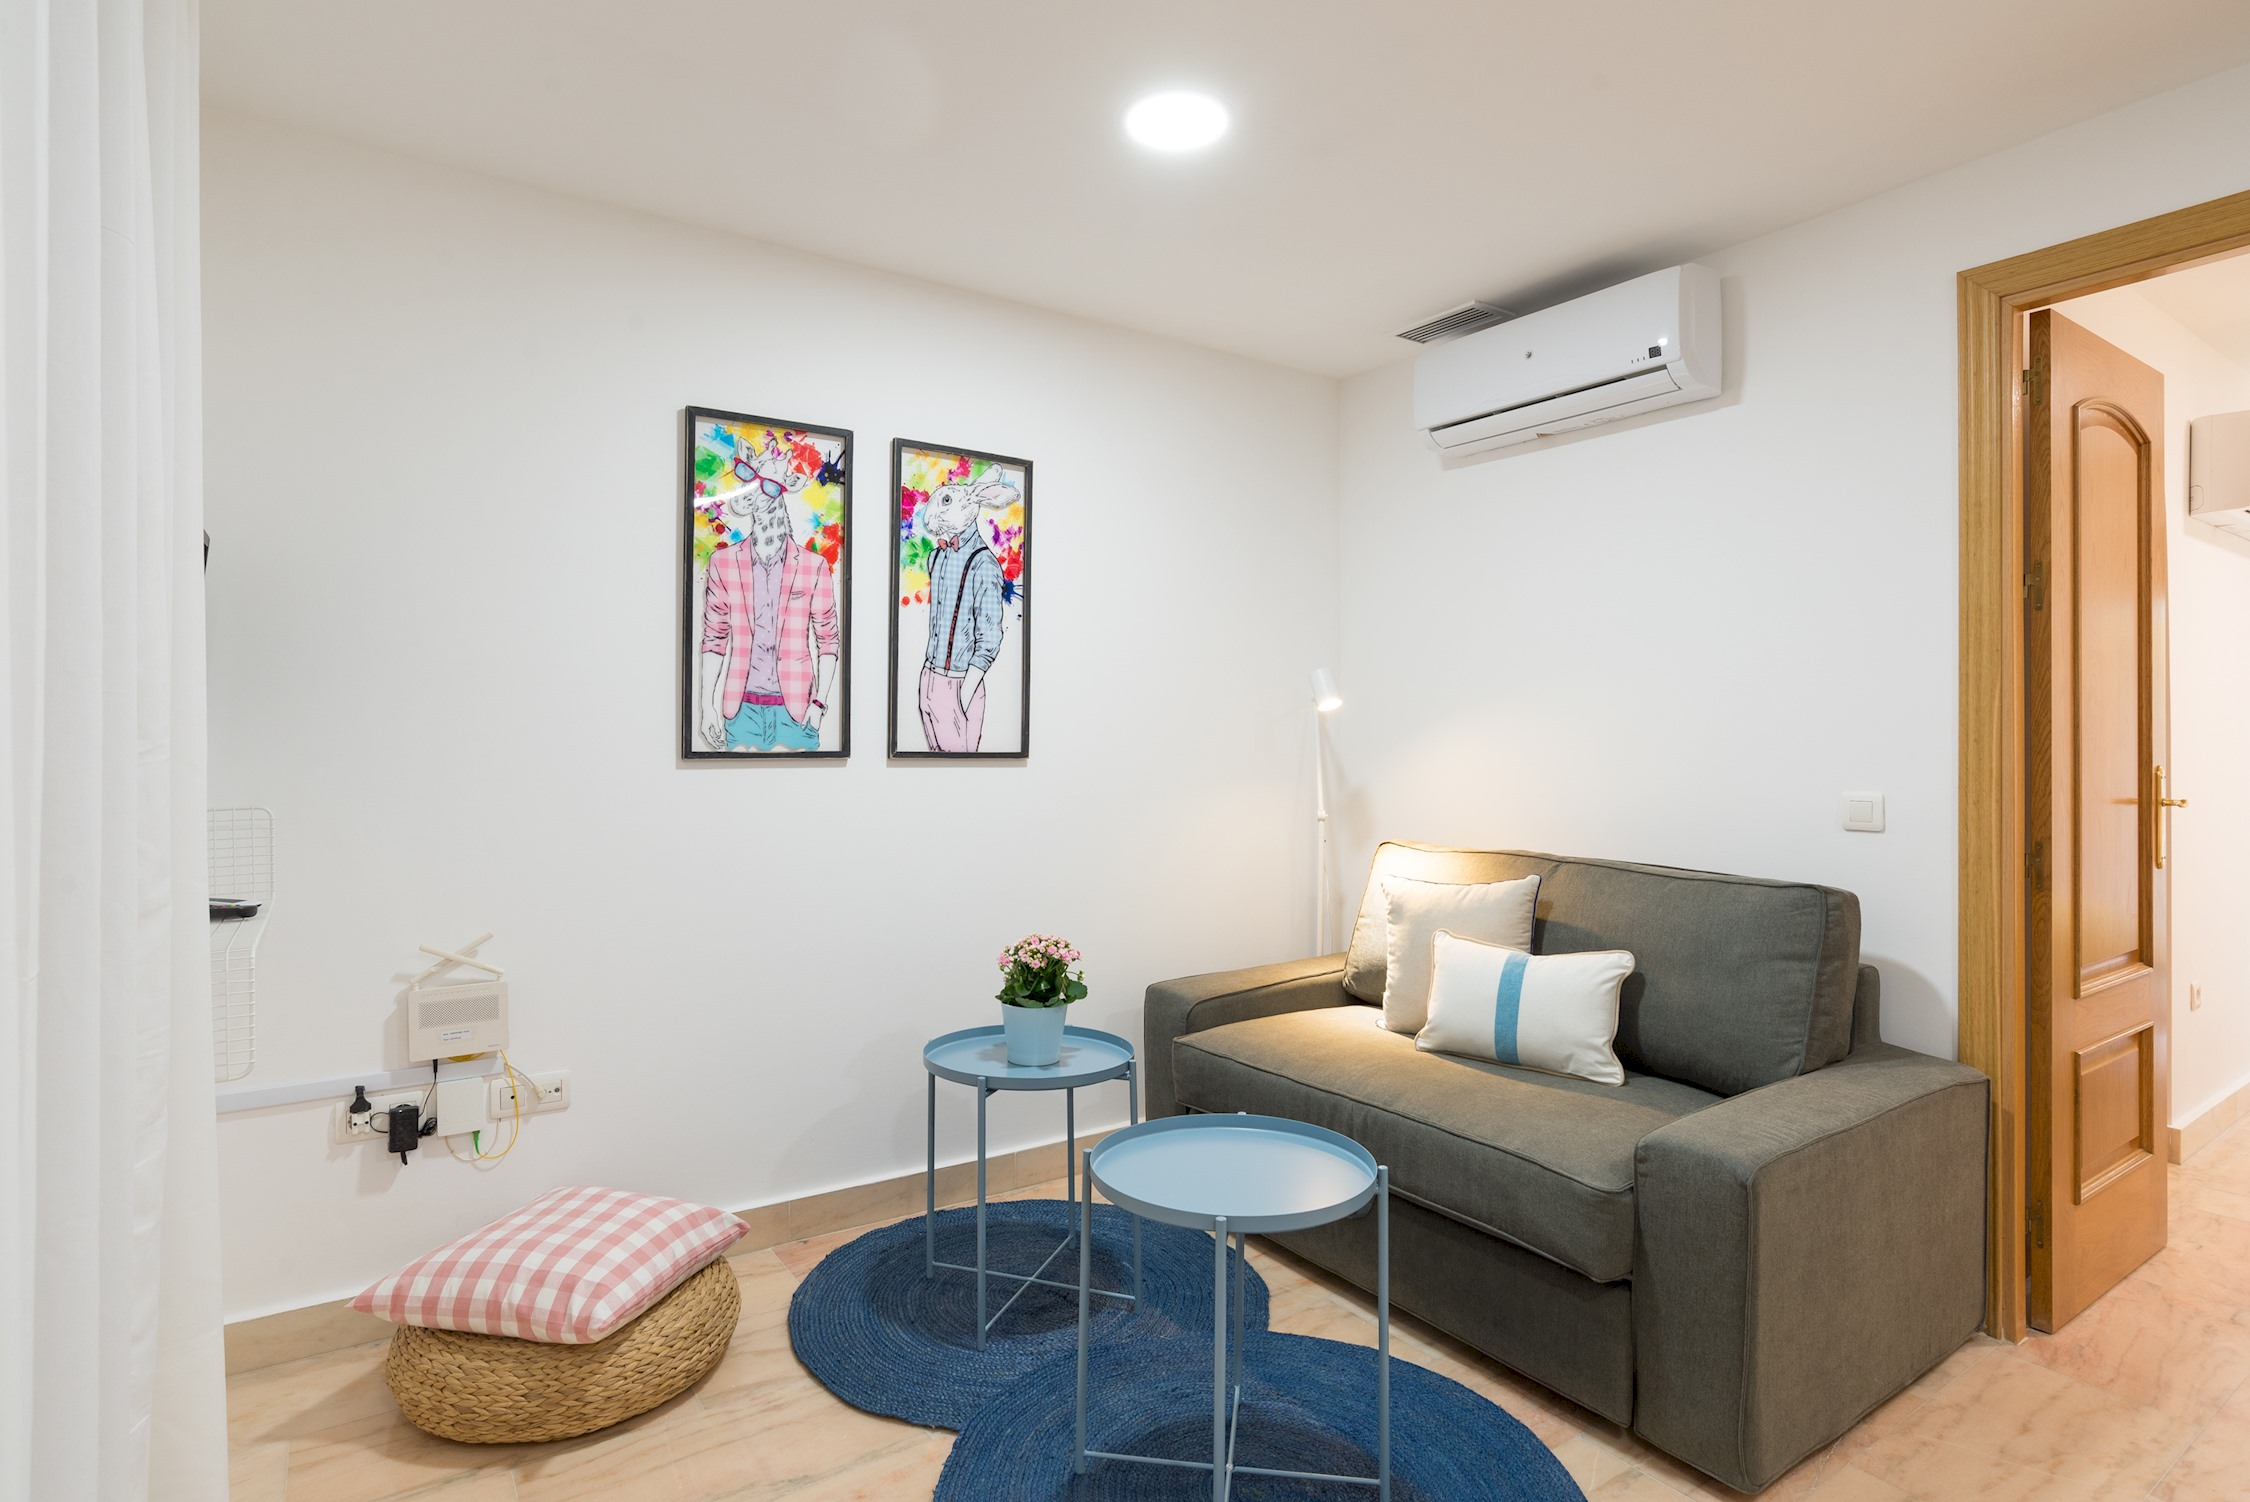 Apartment MalagaSuite Marbella Beach photo 25528501